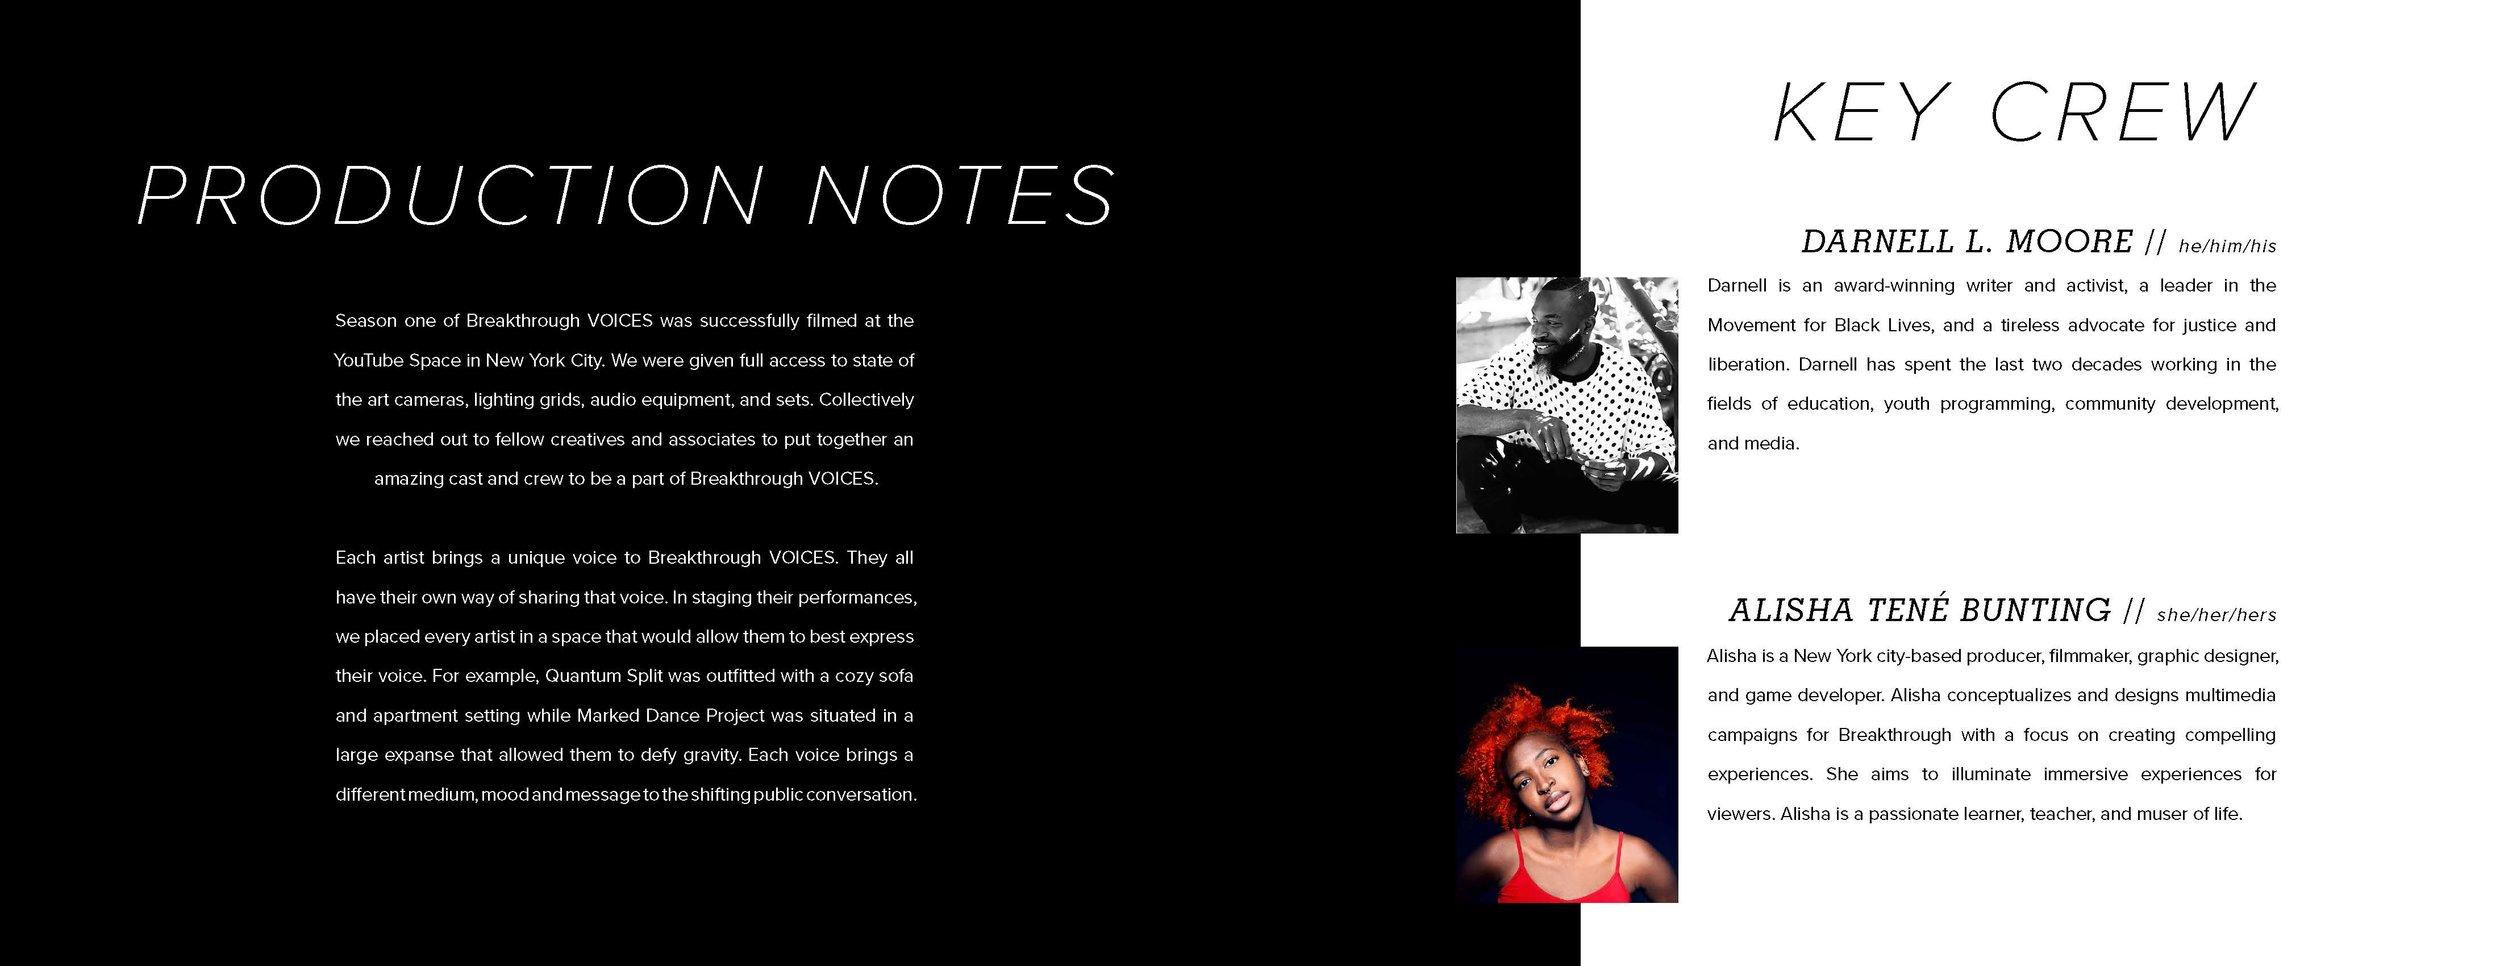 BTV 2019 Press Kit S2 V2_Page_09.jpg